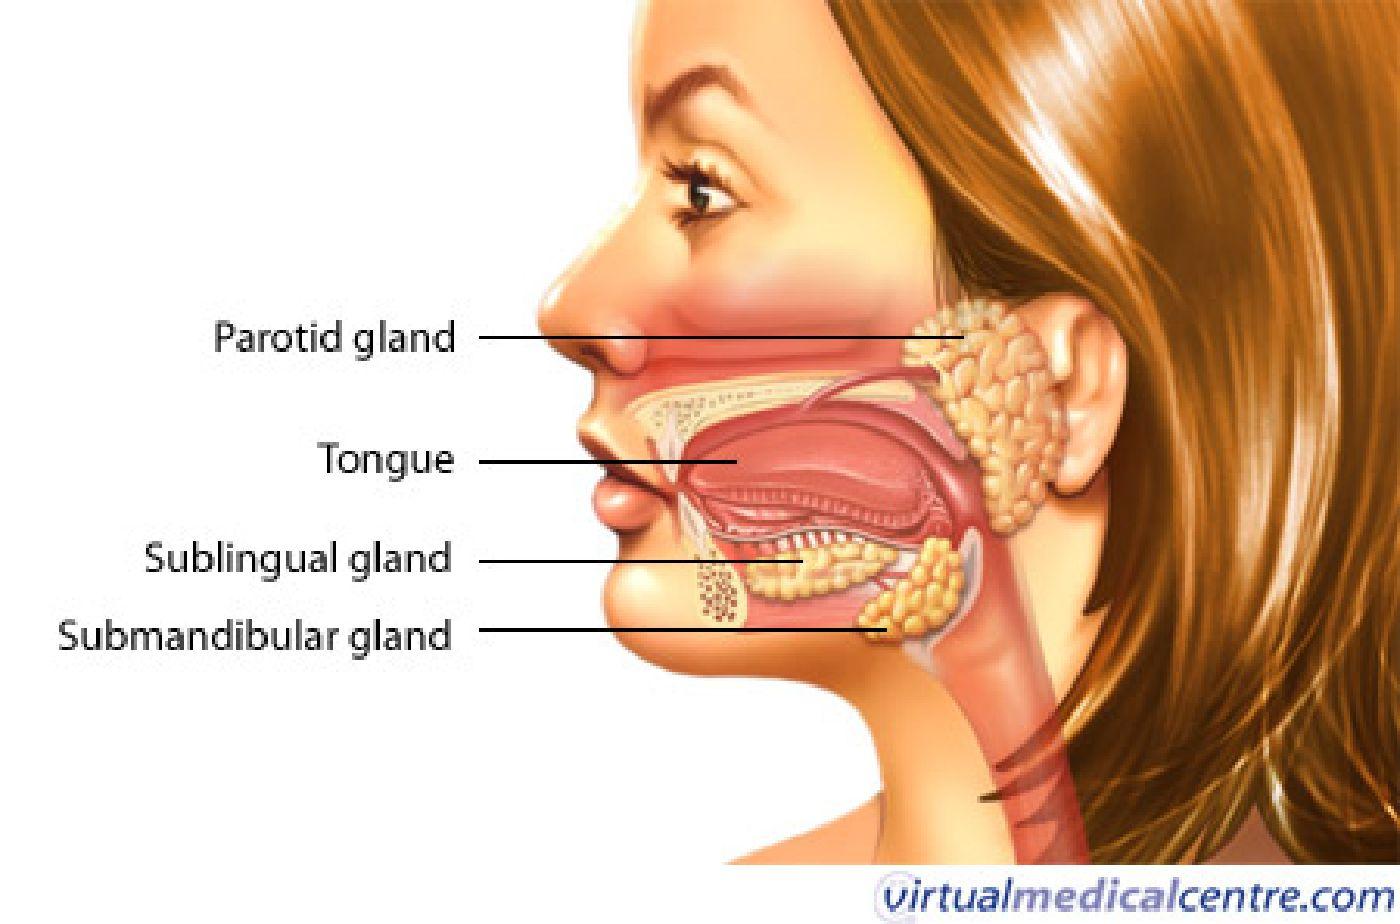 Sexiest woman swollen facial gland aboriginal girl